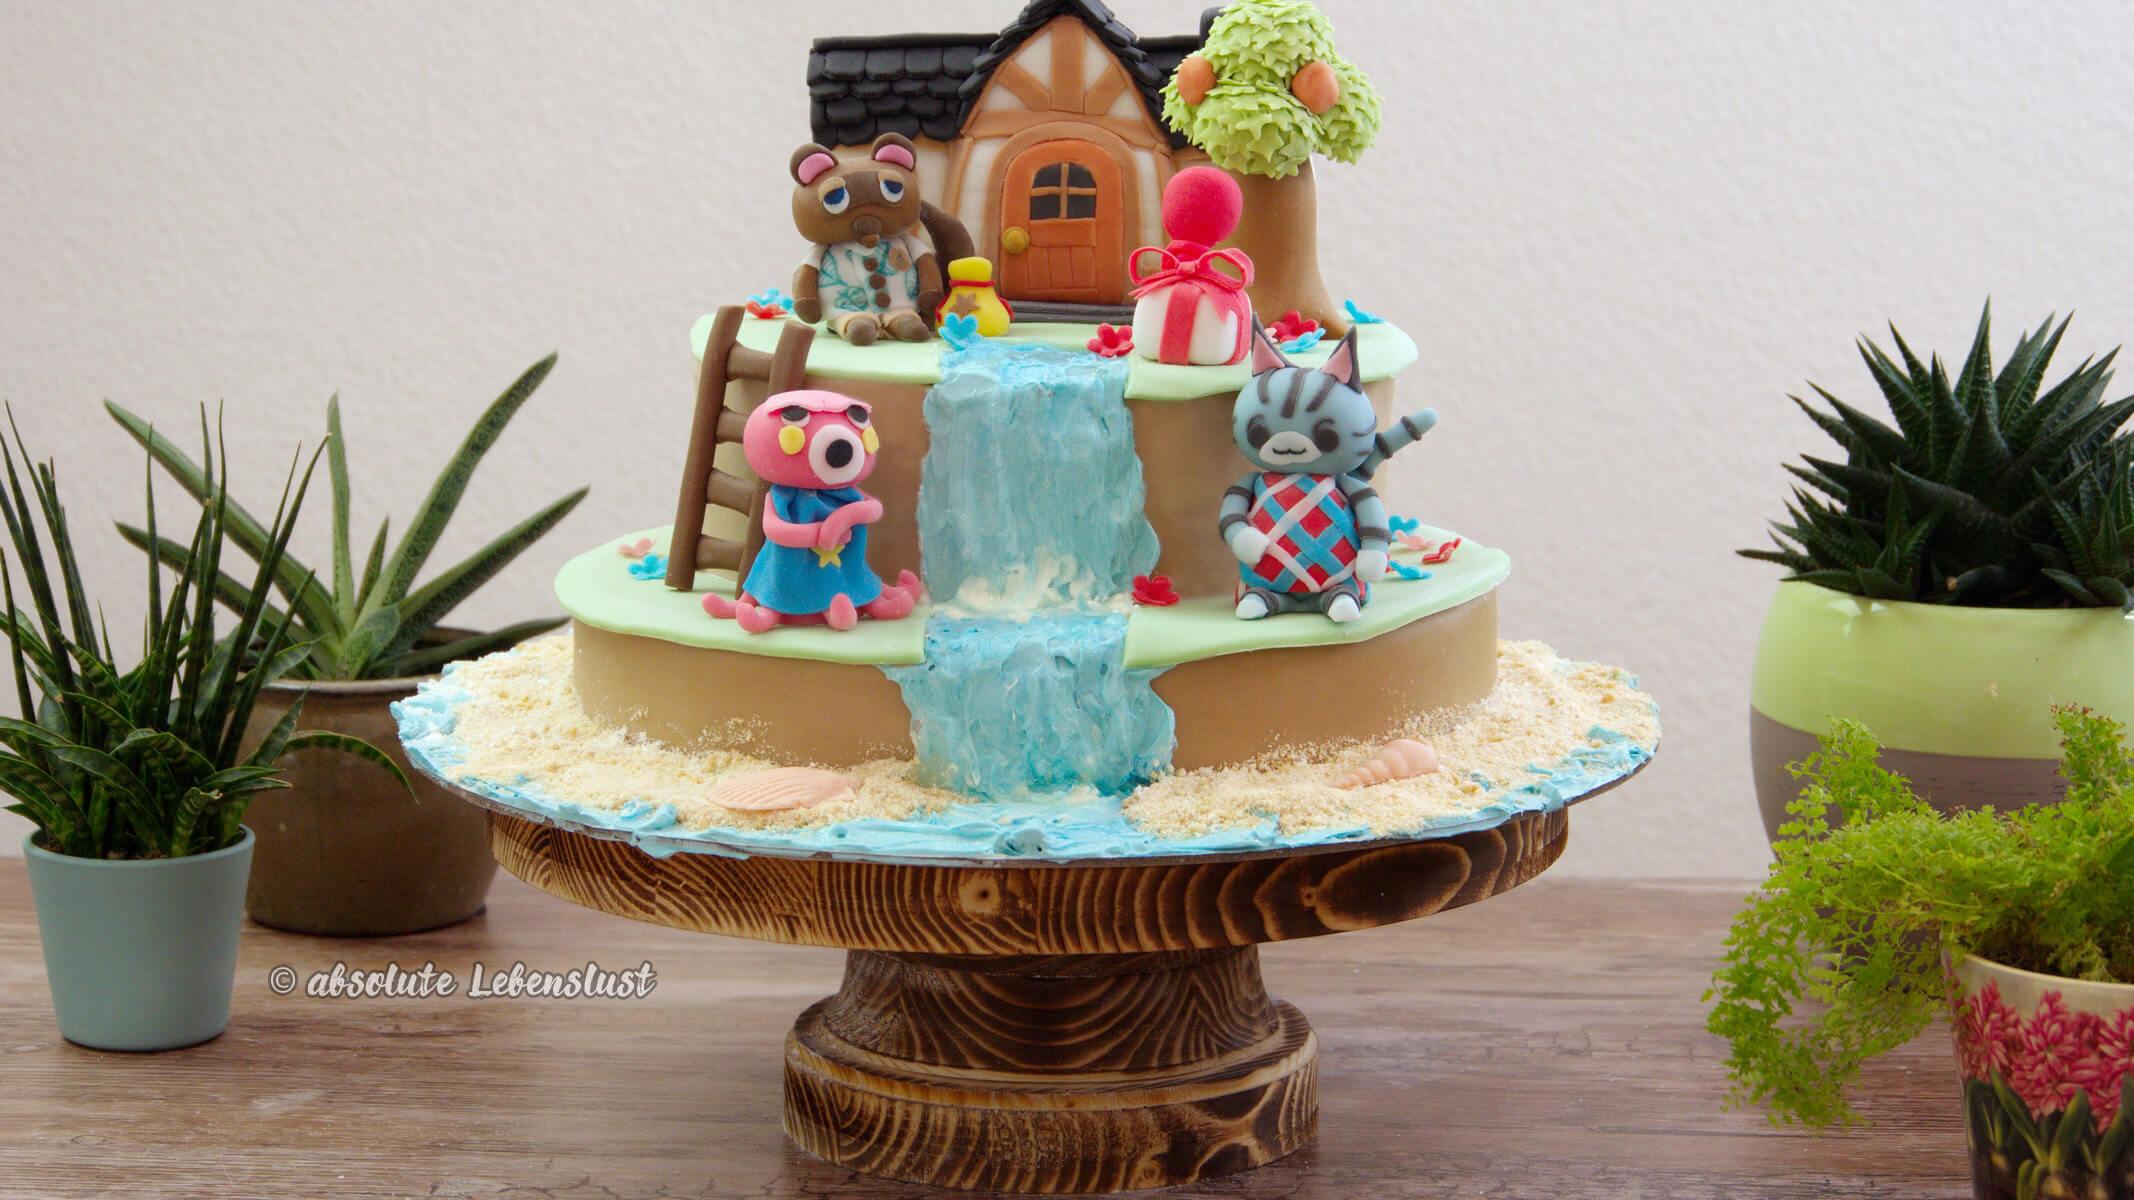 animal crossing, cake, fondant cake, tom nook, strand torte, urlaub torte, urlaubstorte, new horizons